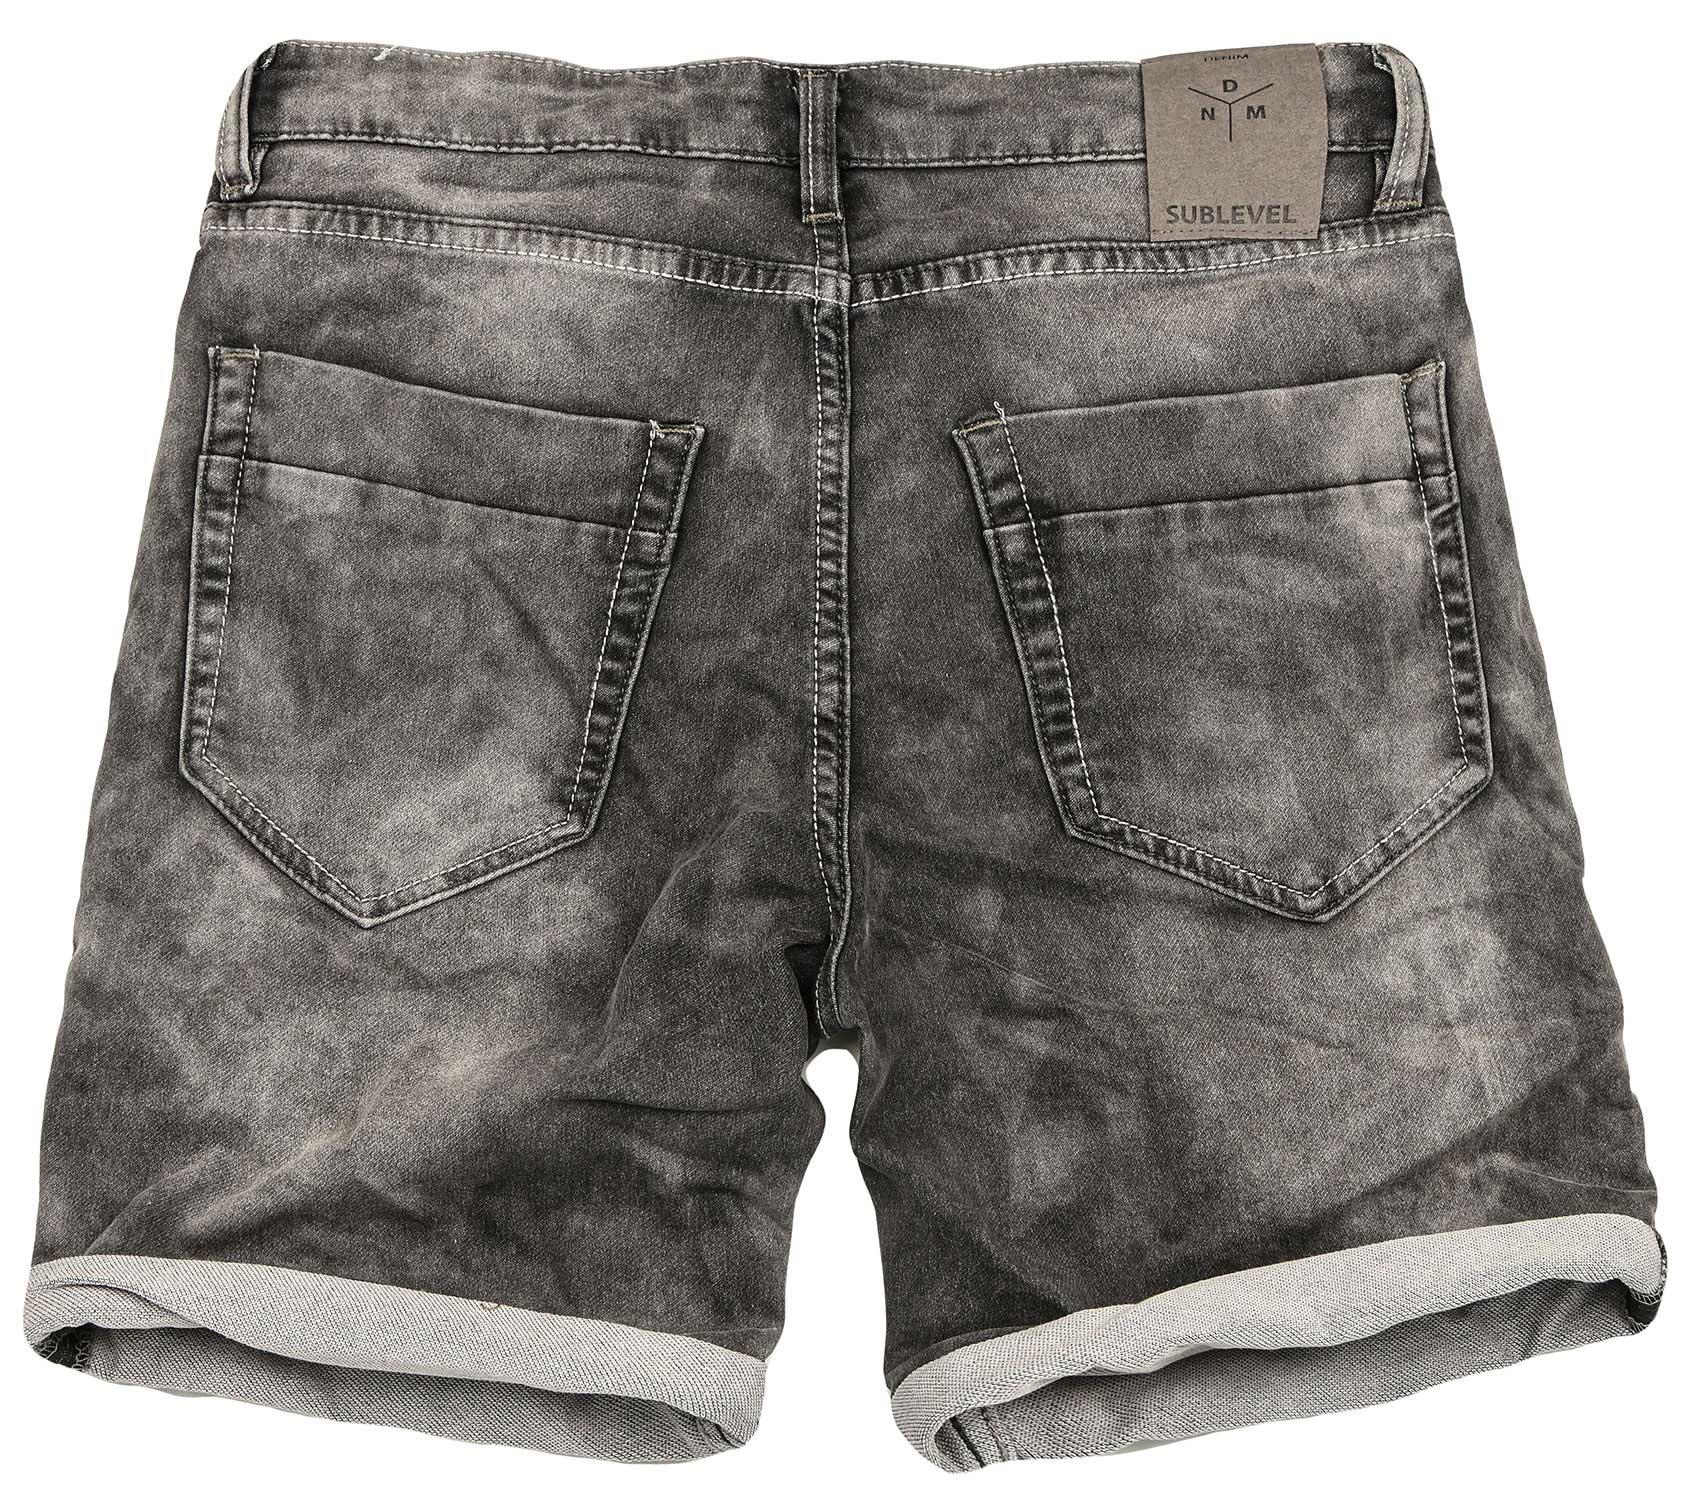 Sublevel-Herren-Sweat-Jeans-Shorts-kurze-Hose-Bermuda-Sommer-Sweathose-Slim-NEU Indexbild 34